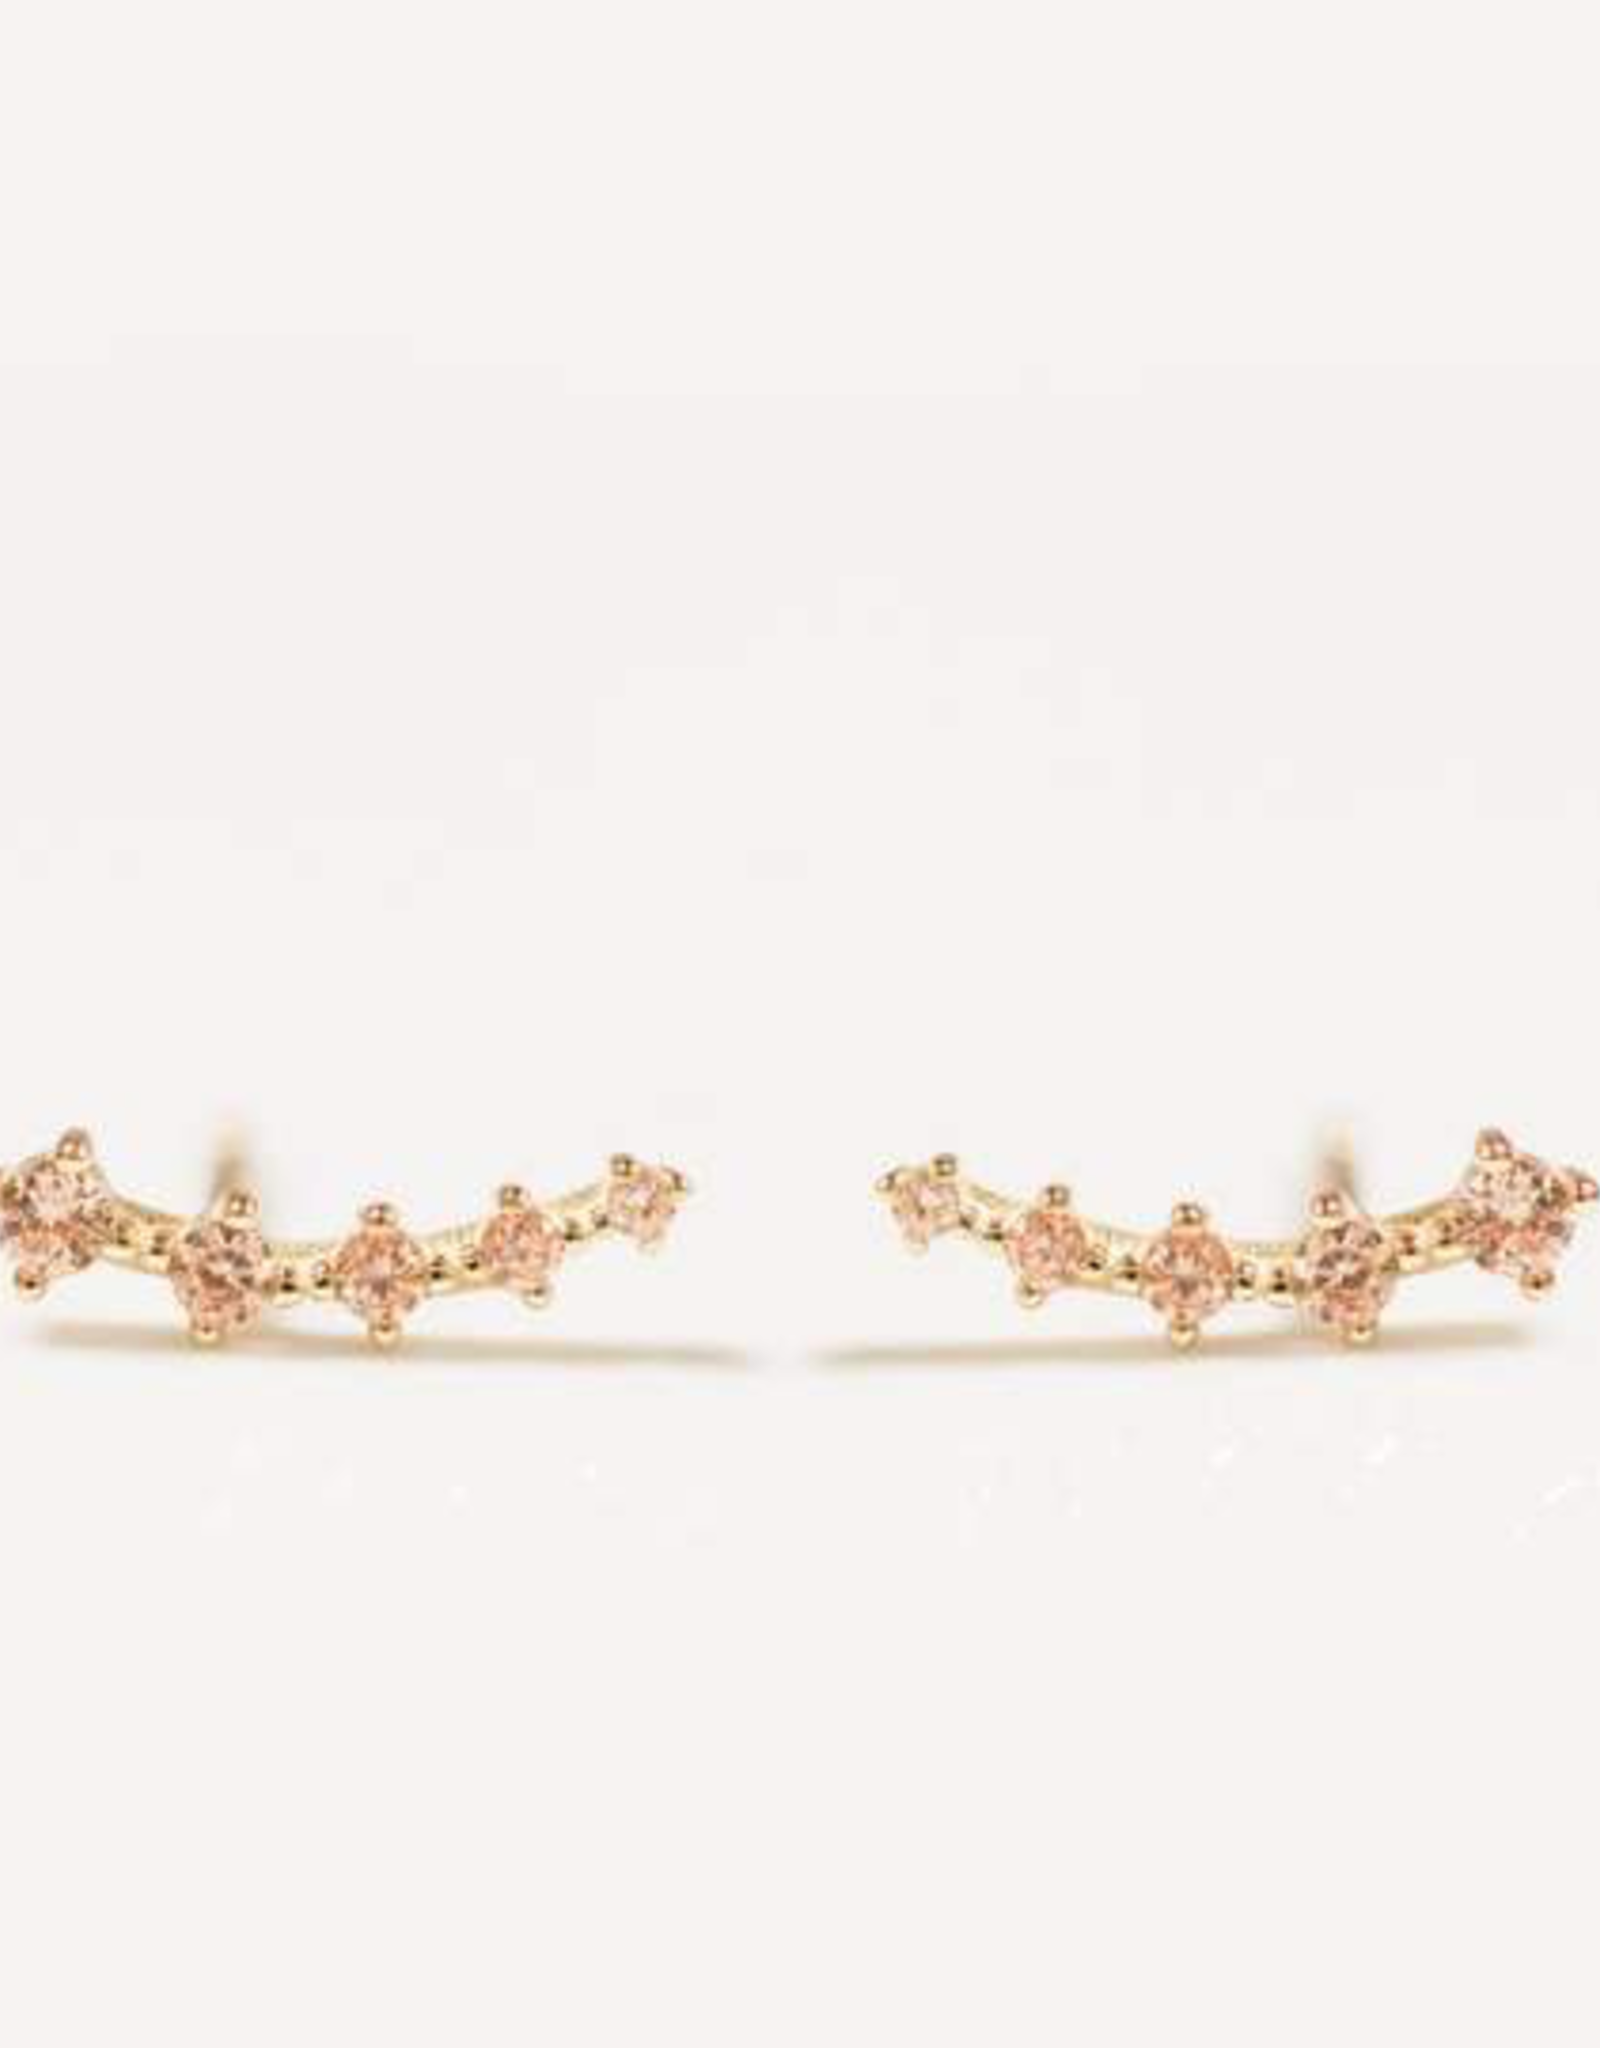 Earrings, Crawler, Champagne